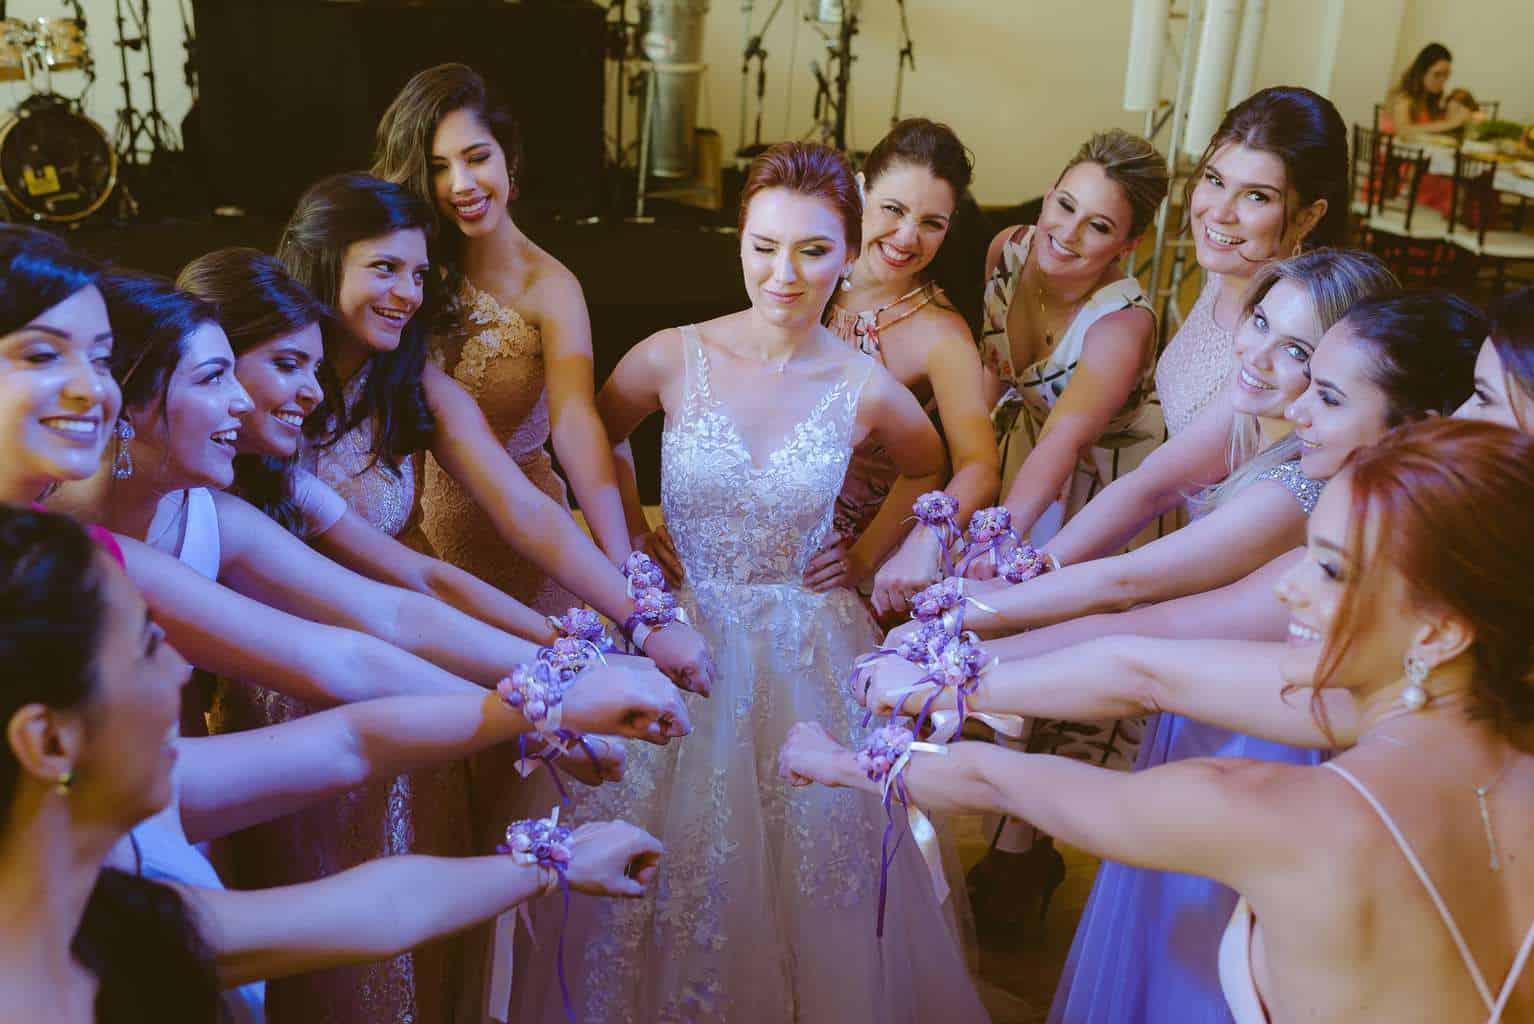 casamento-ao-ar-livre-casamento-boho-casamento-geek-casamento-rustico-casamento-Thais-e-Pedro-Revoar-Fotografia-Villa-Borghese-Eventos-63